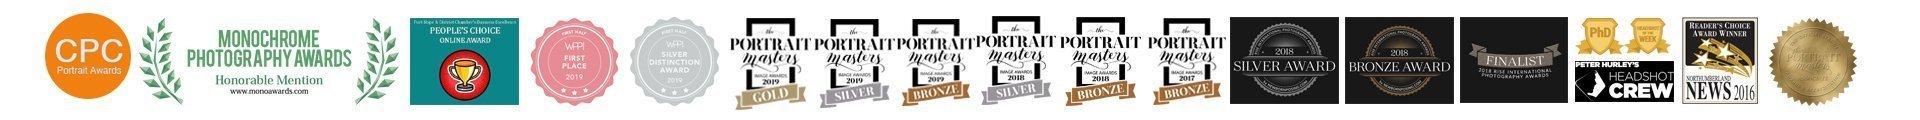 International awards won by photographer Alana Lee